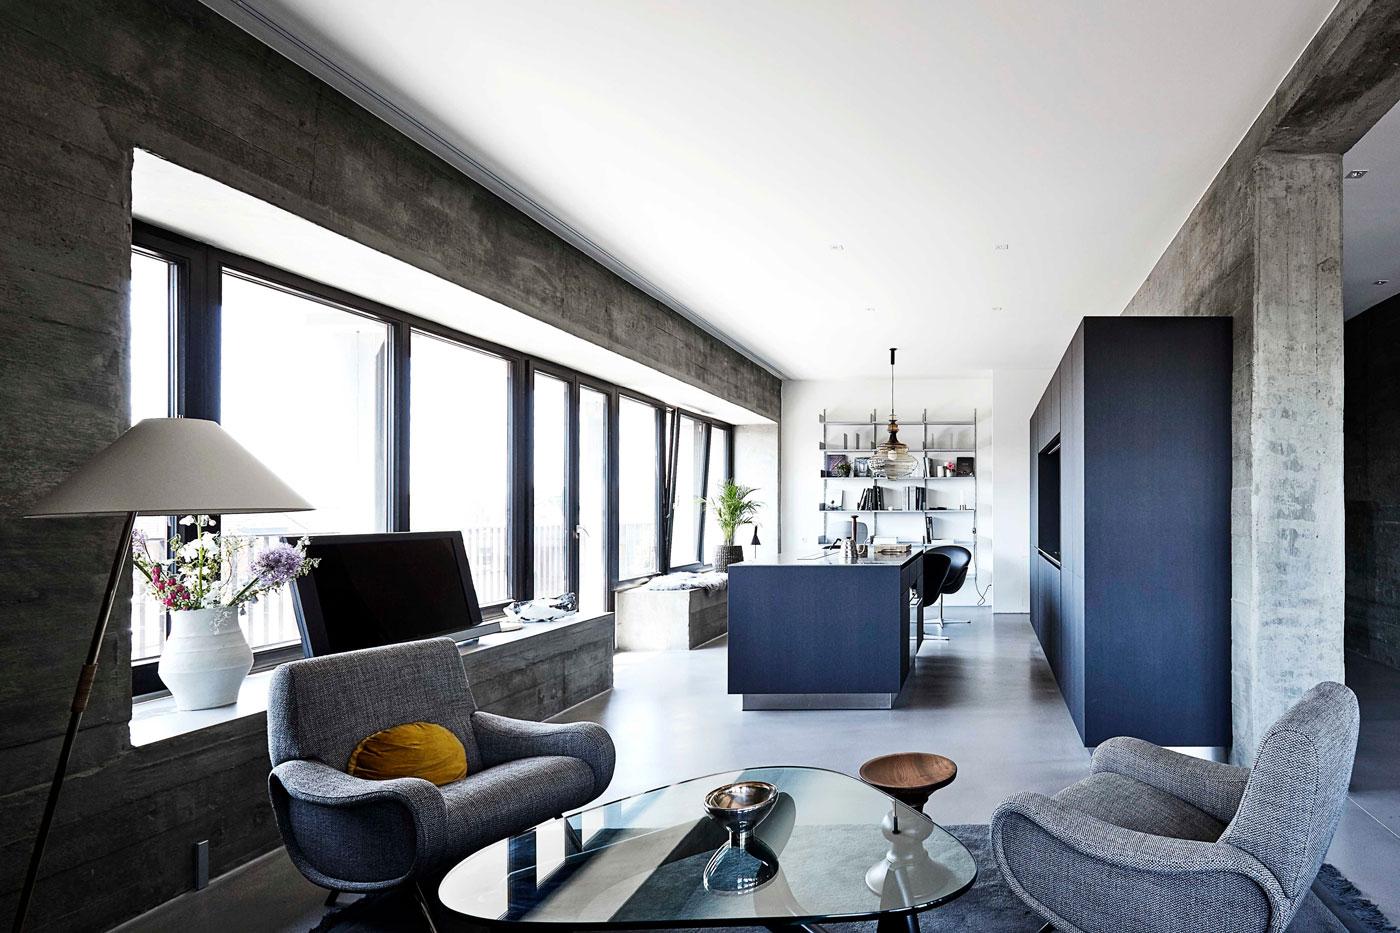 Blue kitchen island, glass coffee table